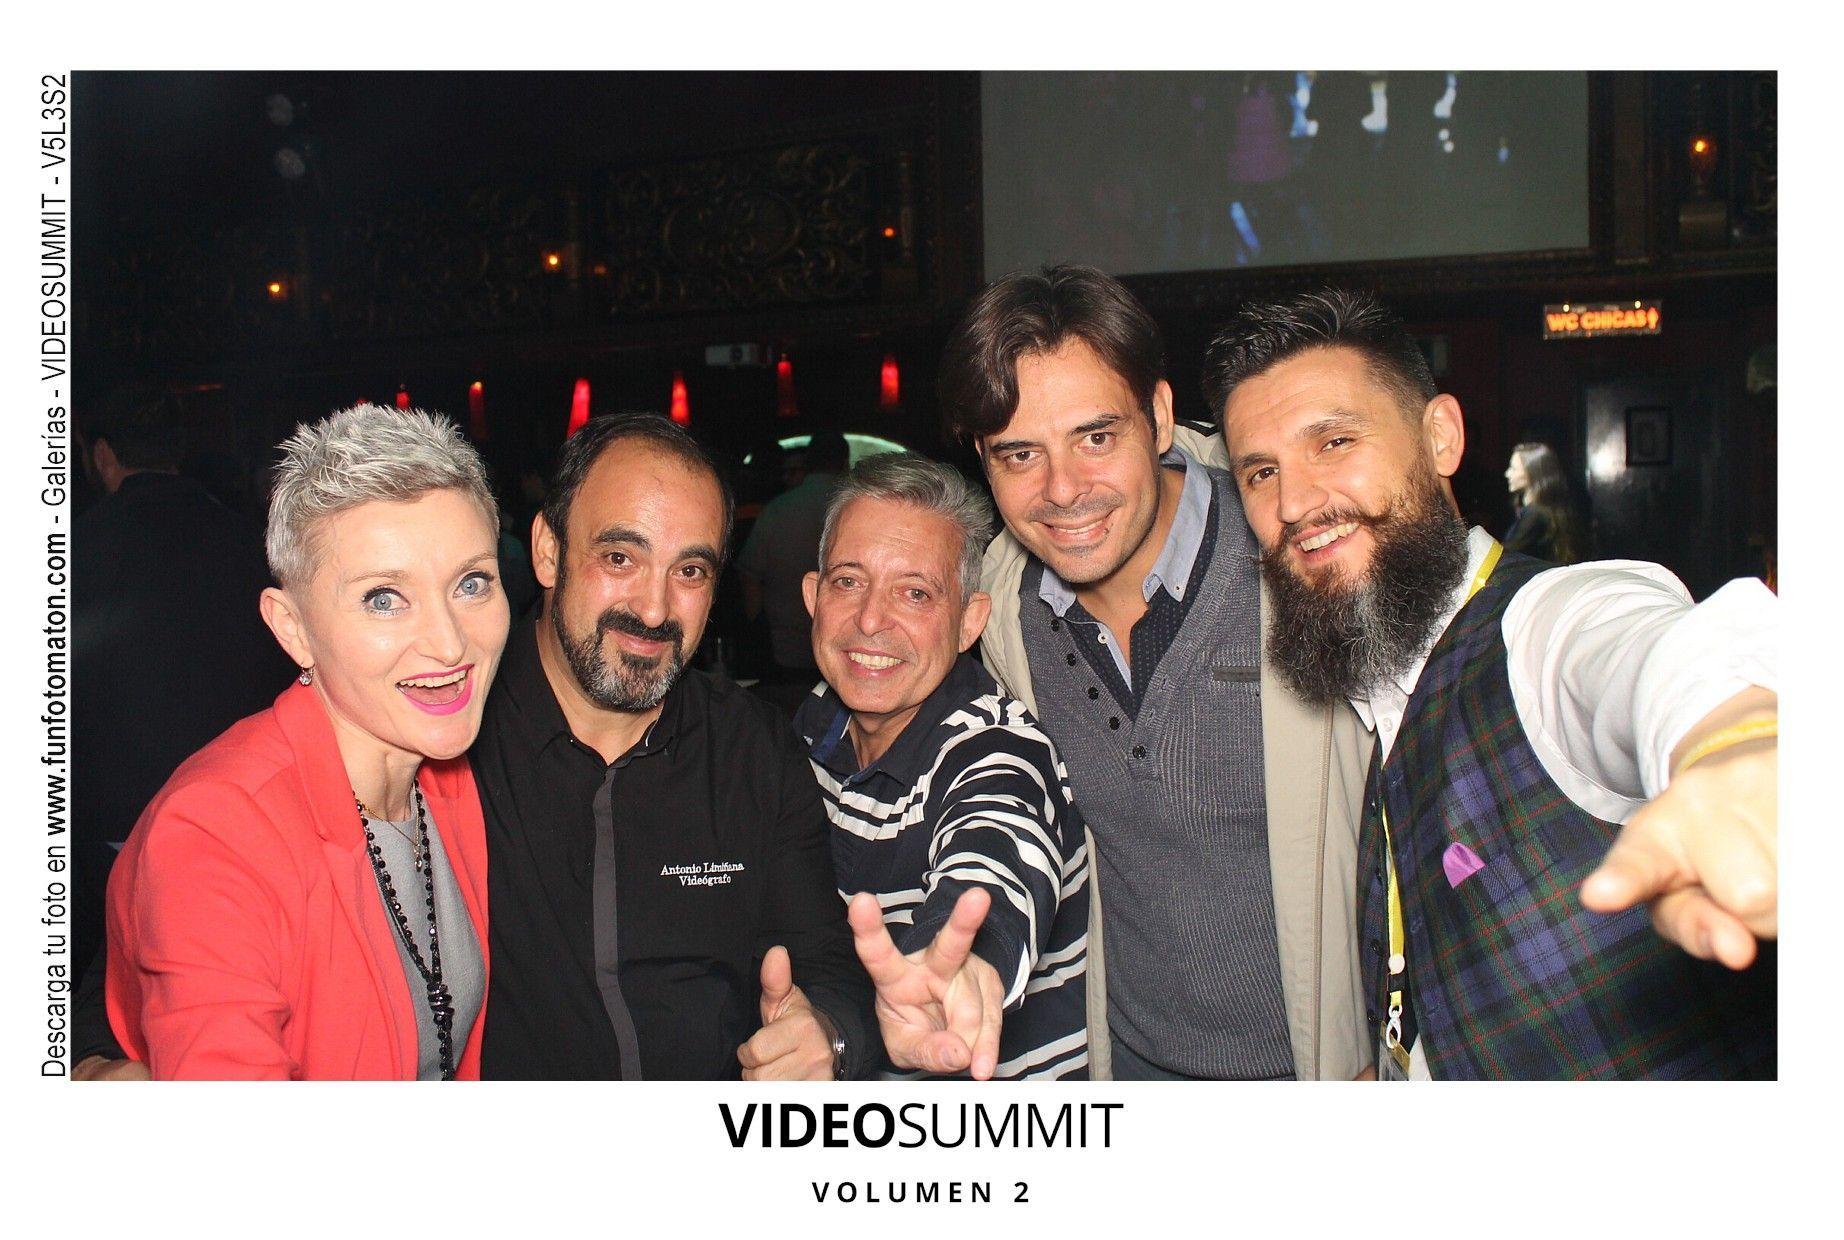 videosummit-vol2-club-party-031